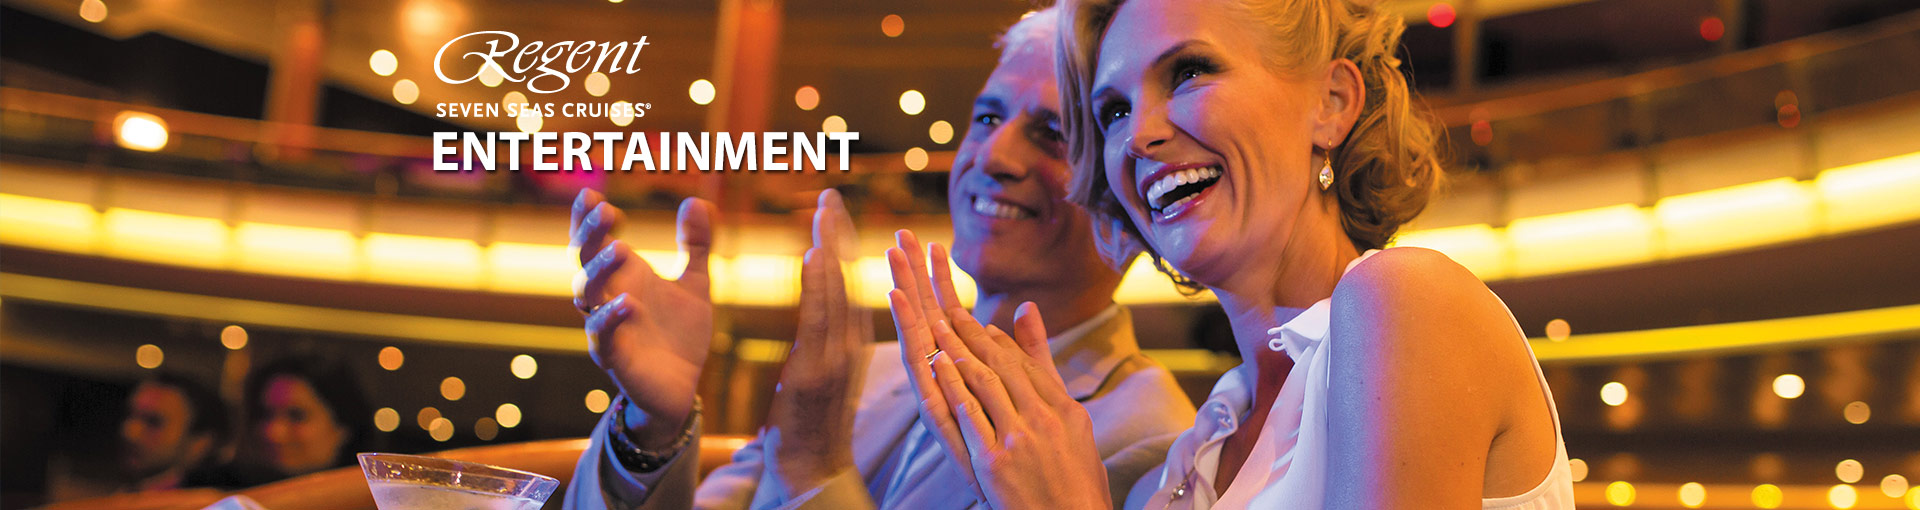 Regent Seven Seas Cruises Entertainment